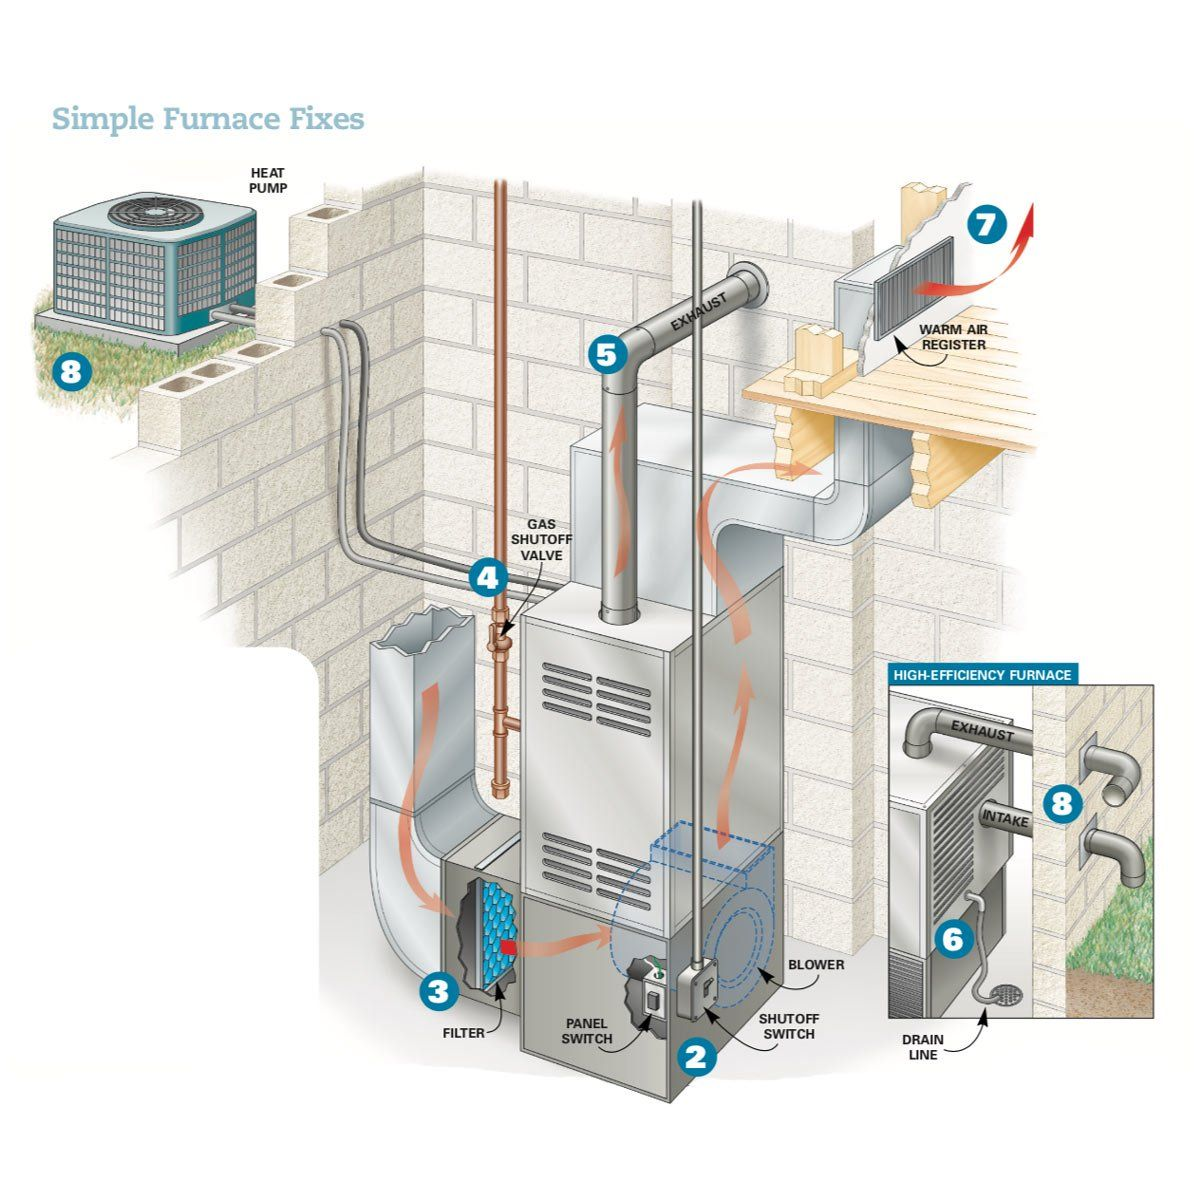 Simple Furnace Fixes Furnace repair, Furnace